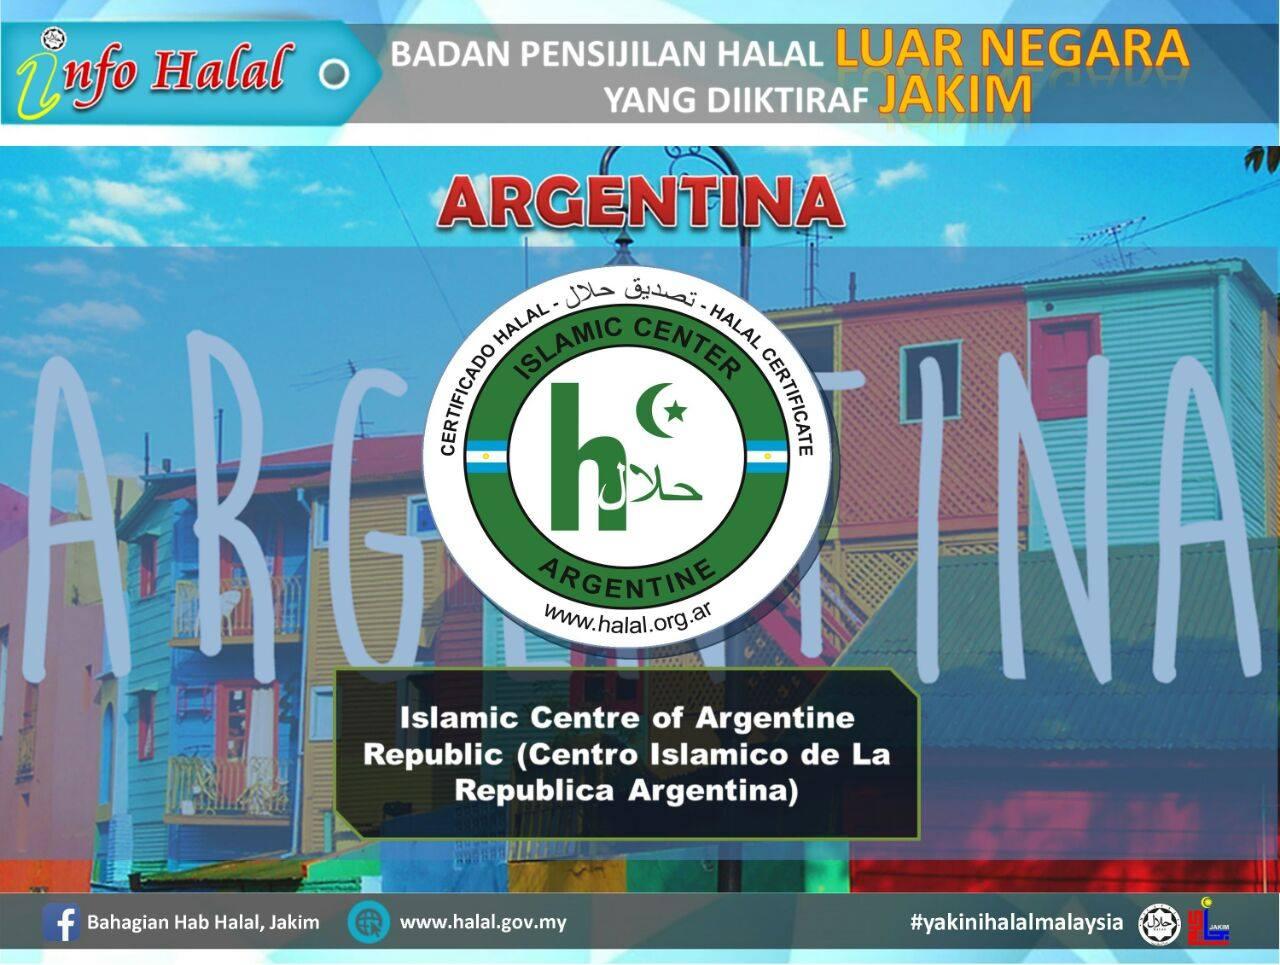 logo halal argentina